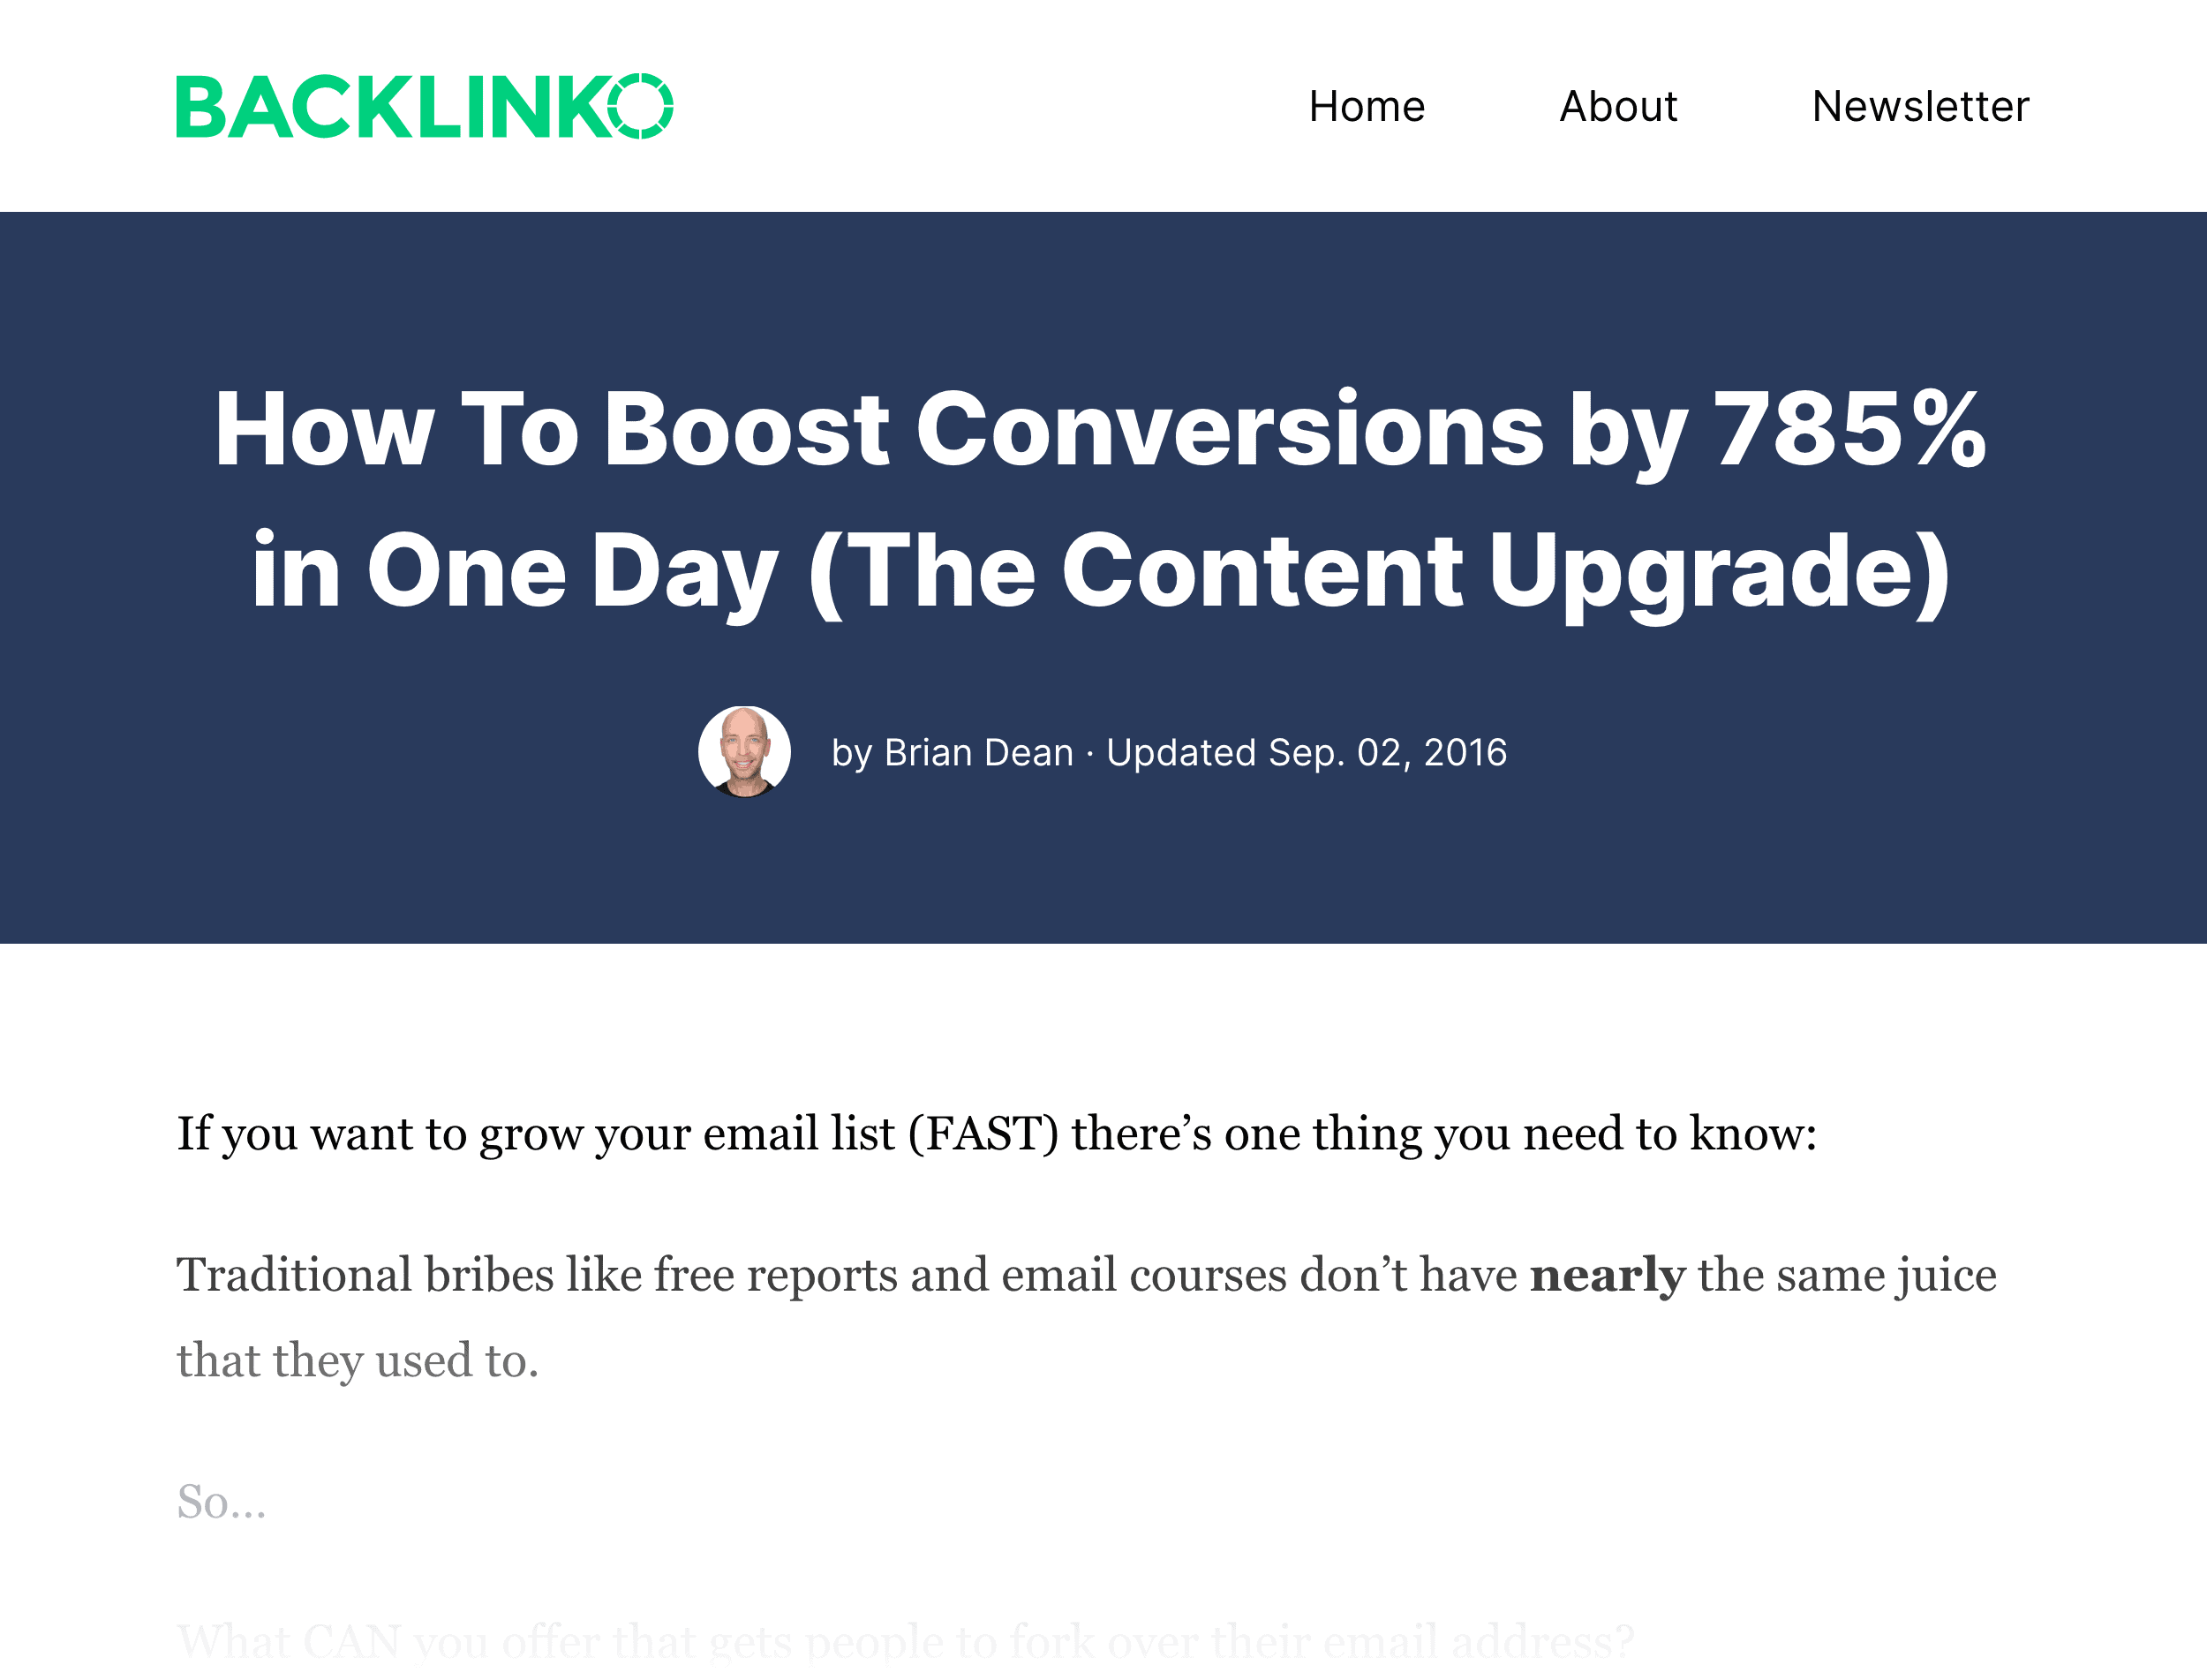 Backlinko – The Content Upgrade